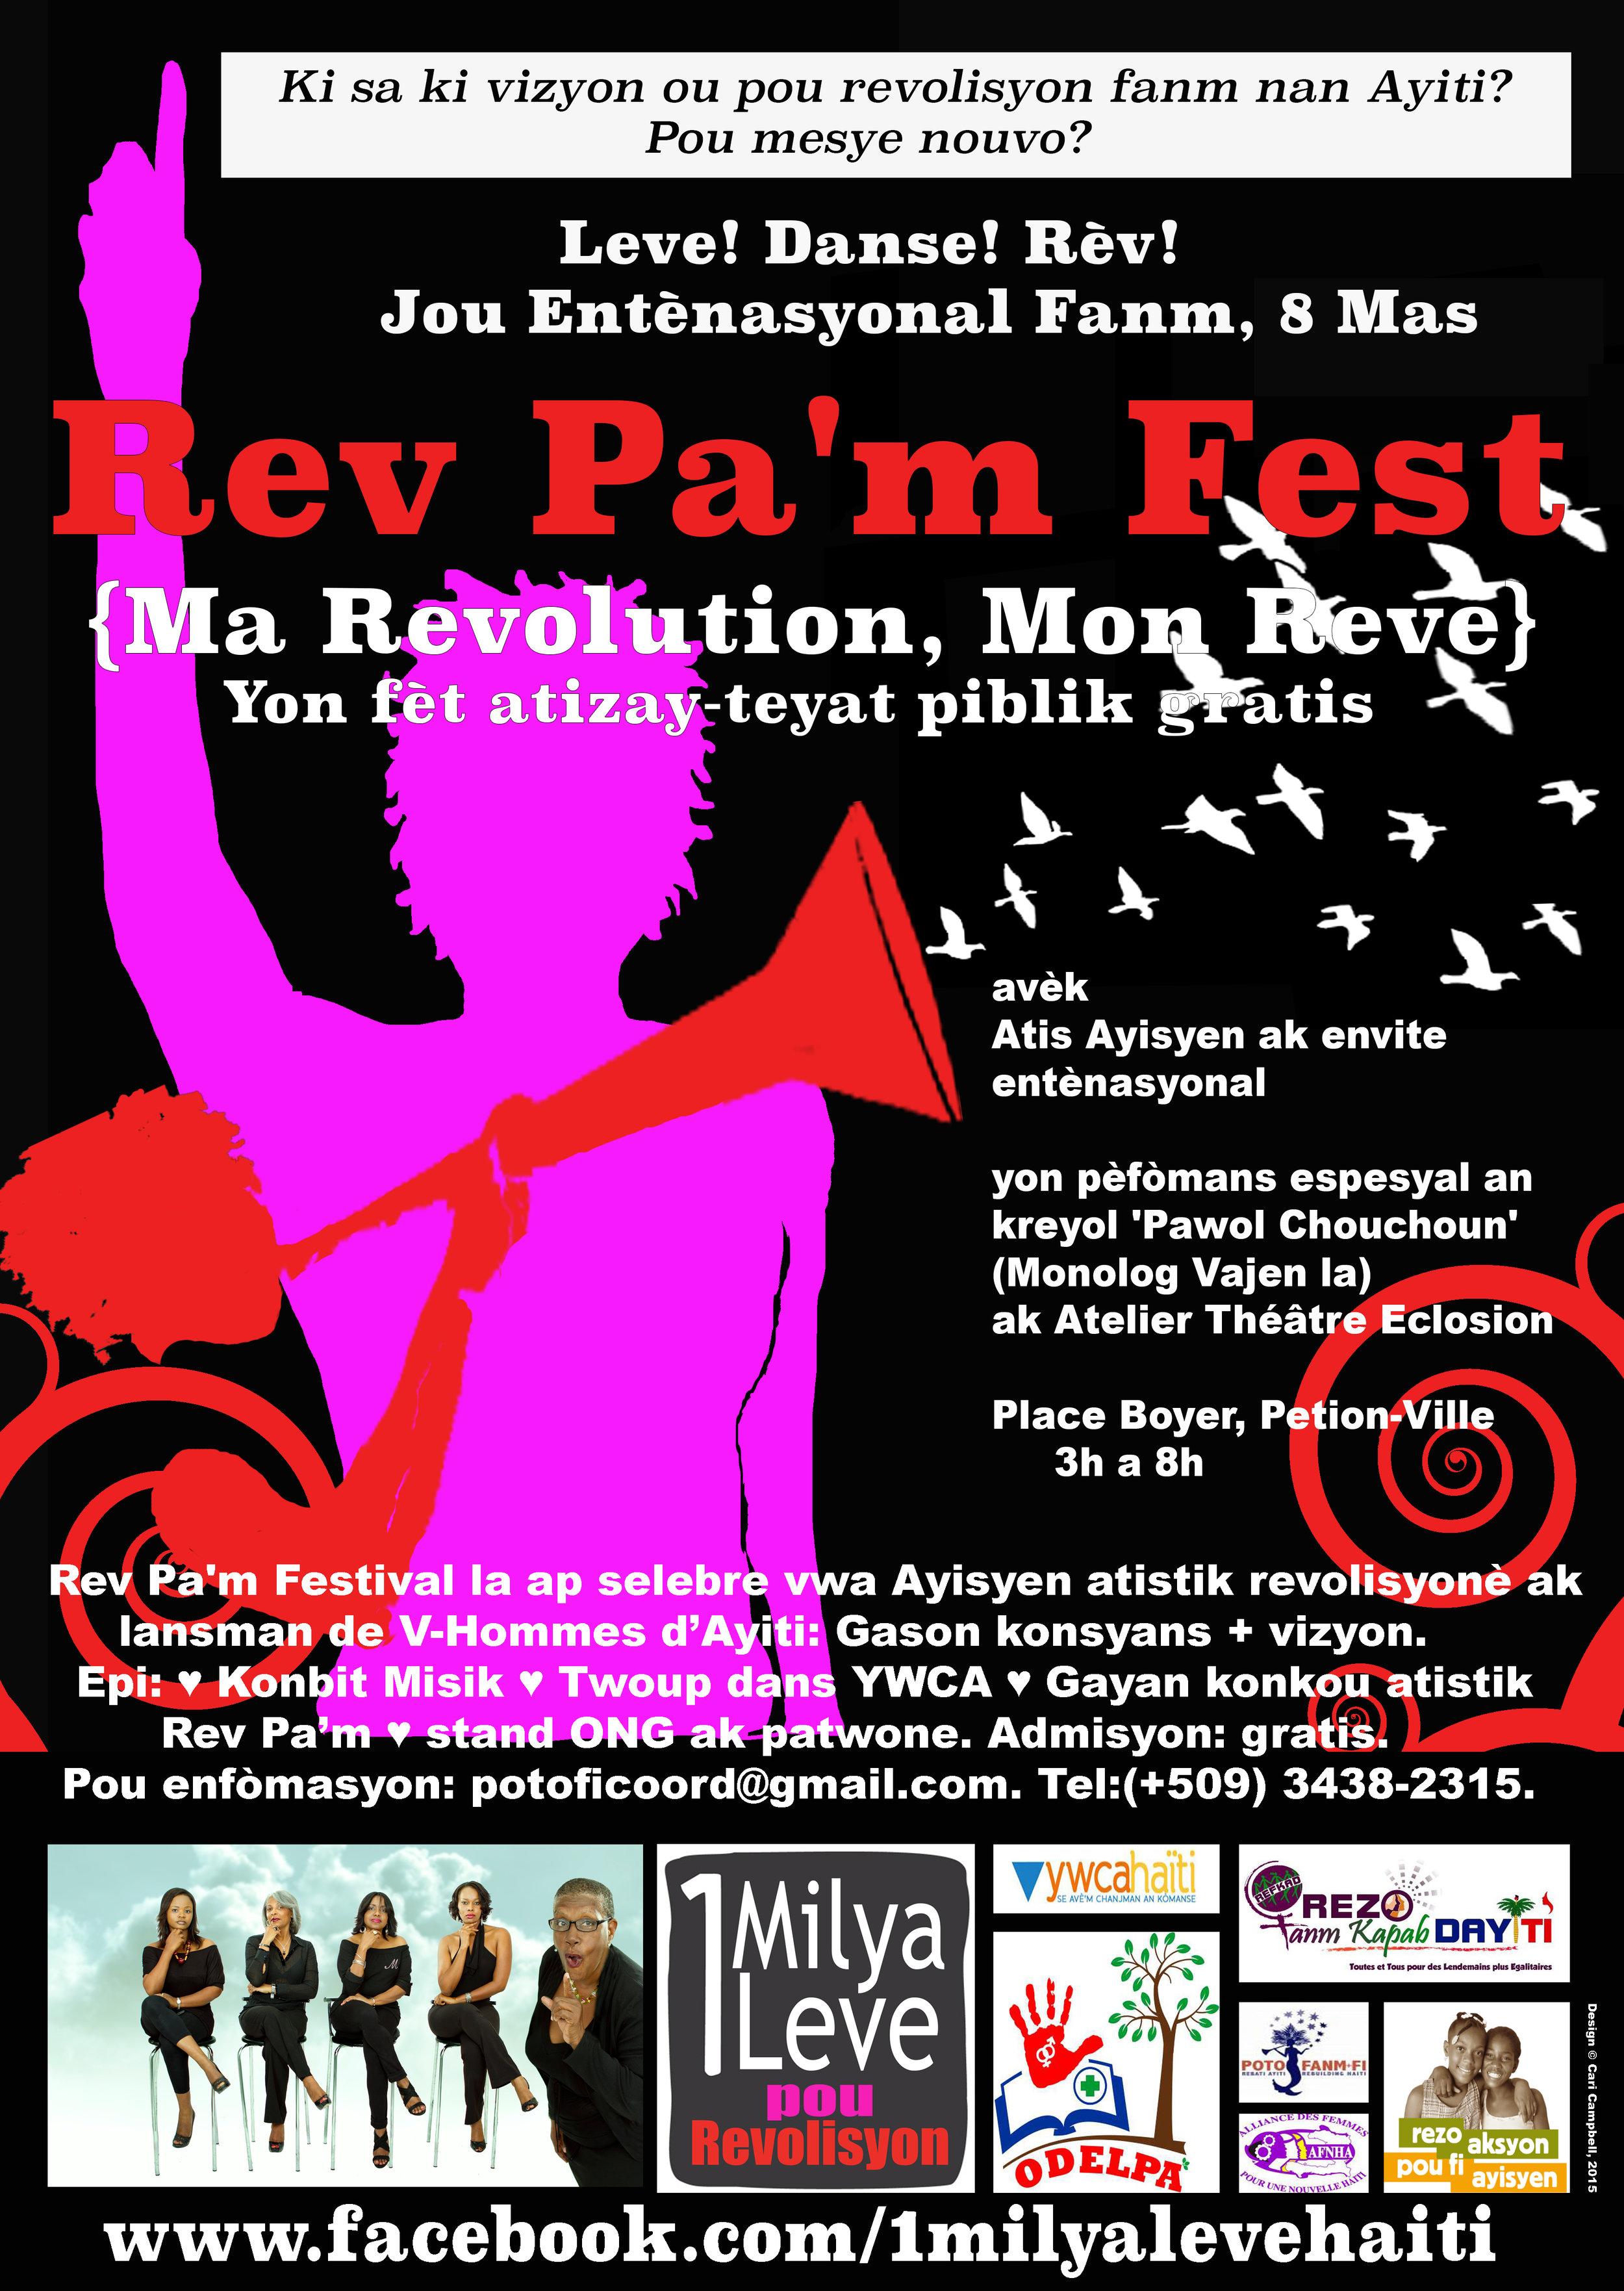 Poster for the Haiti My Revolution Festival (Rev Pa'm in Kreyol), March 8, 2014.